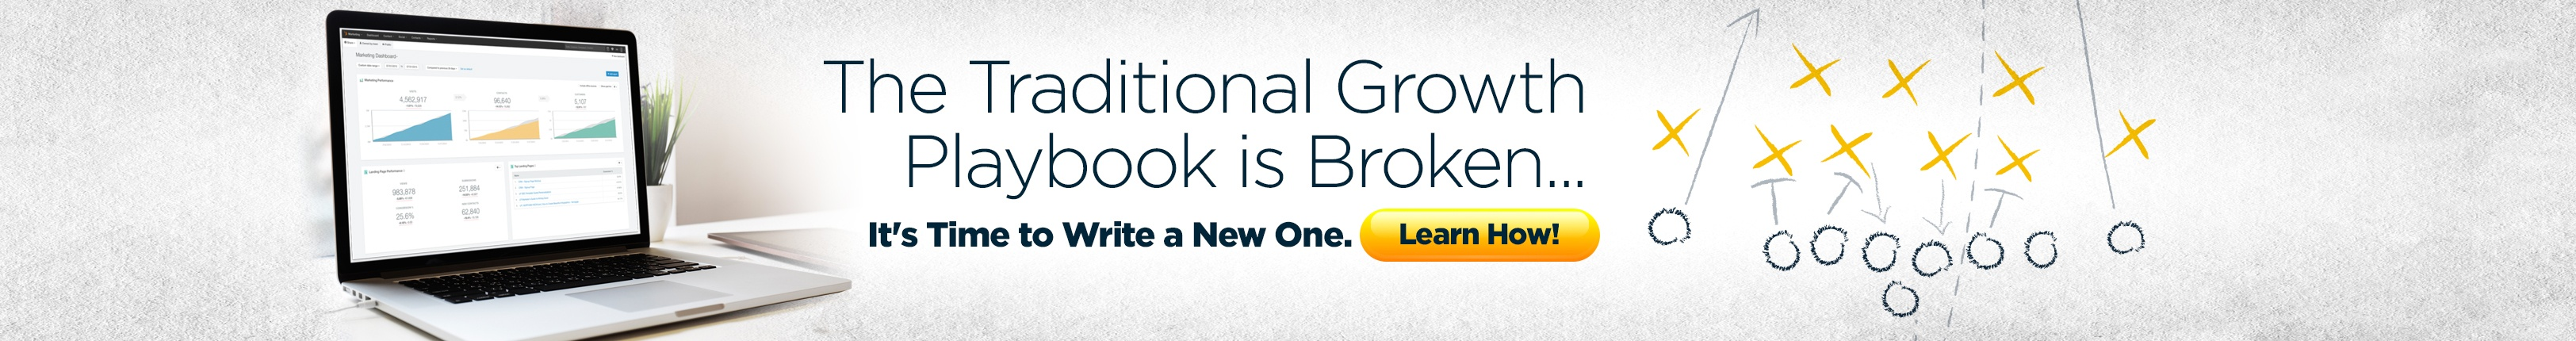 Imagine_Website_Playbook_Header.jpg